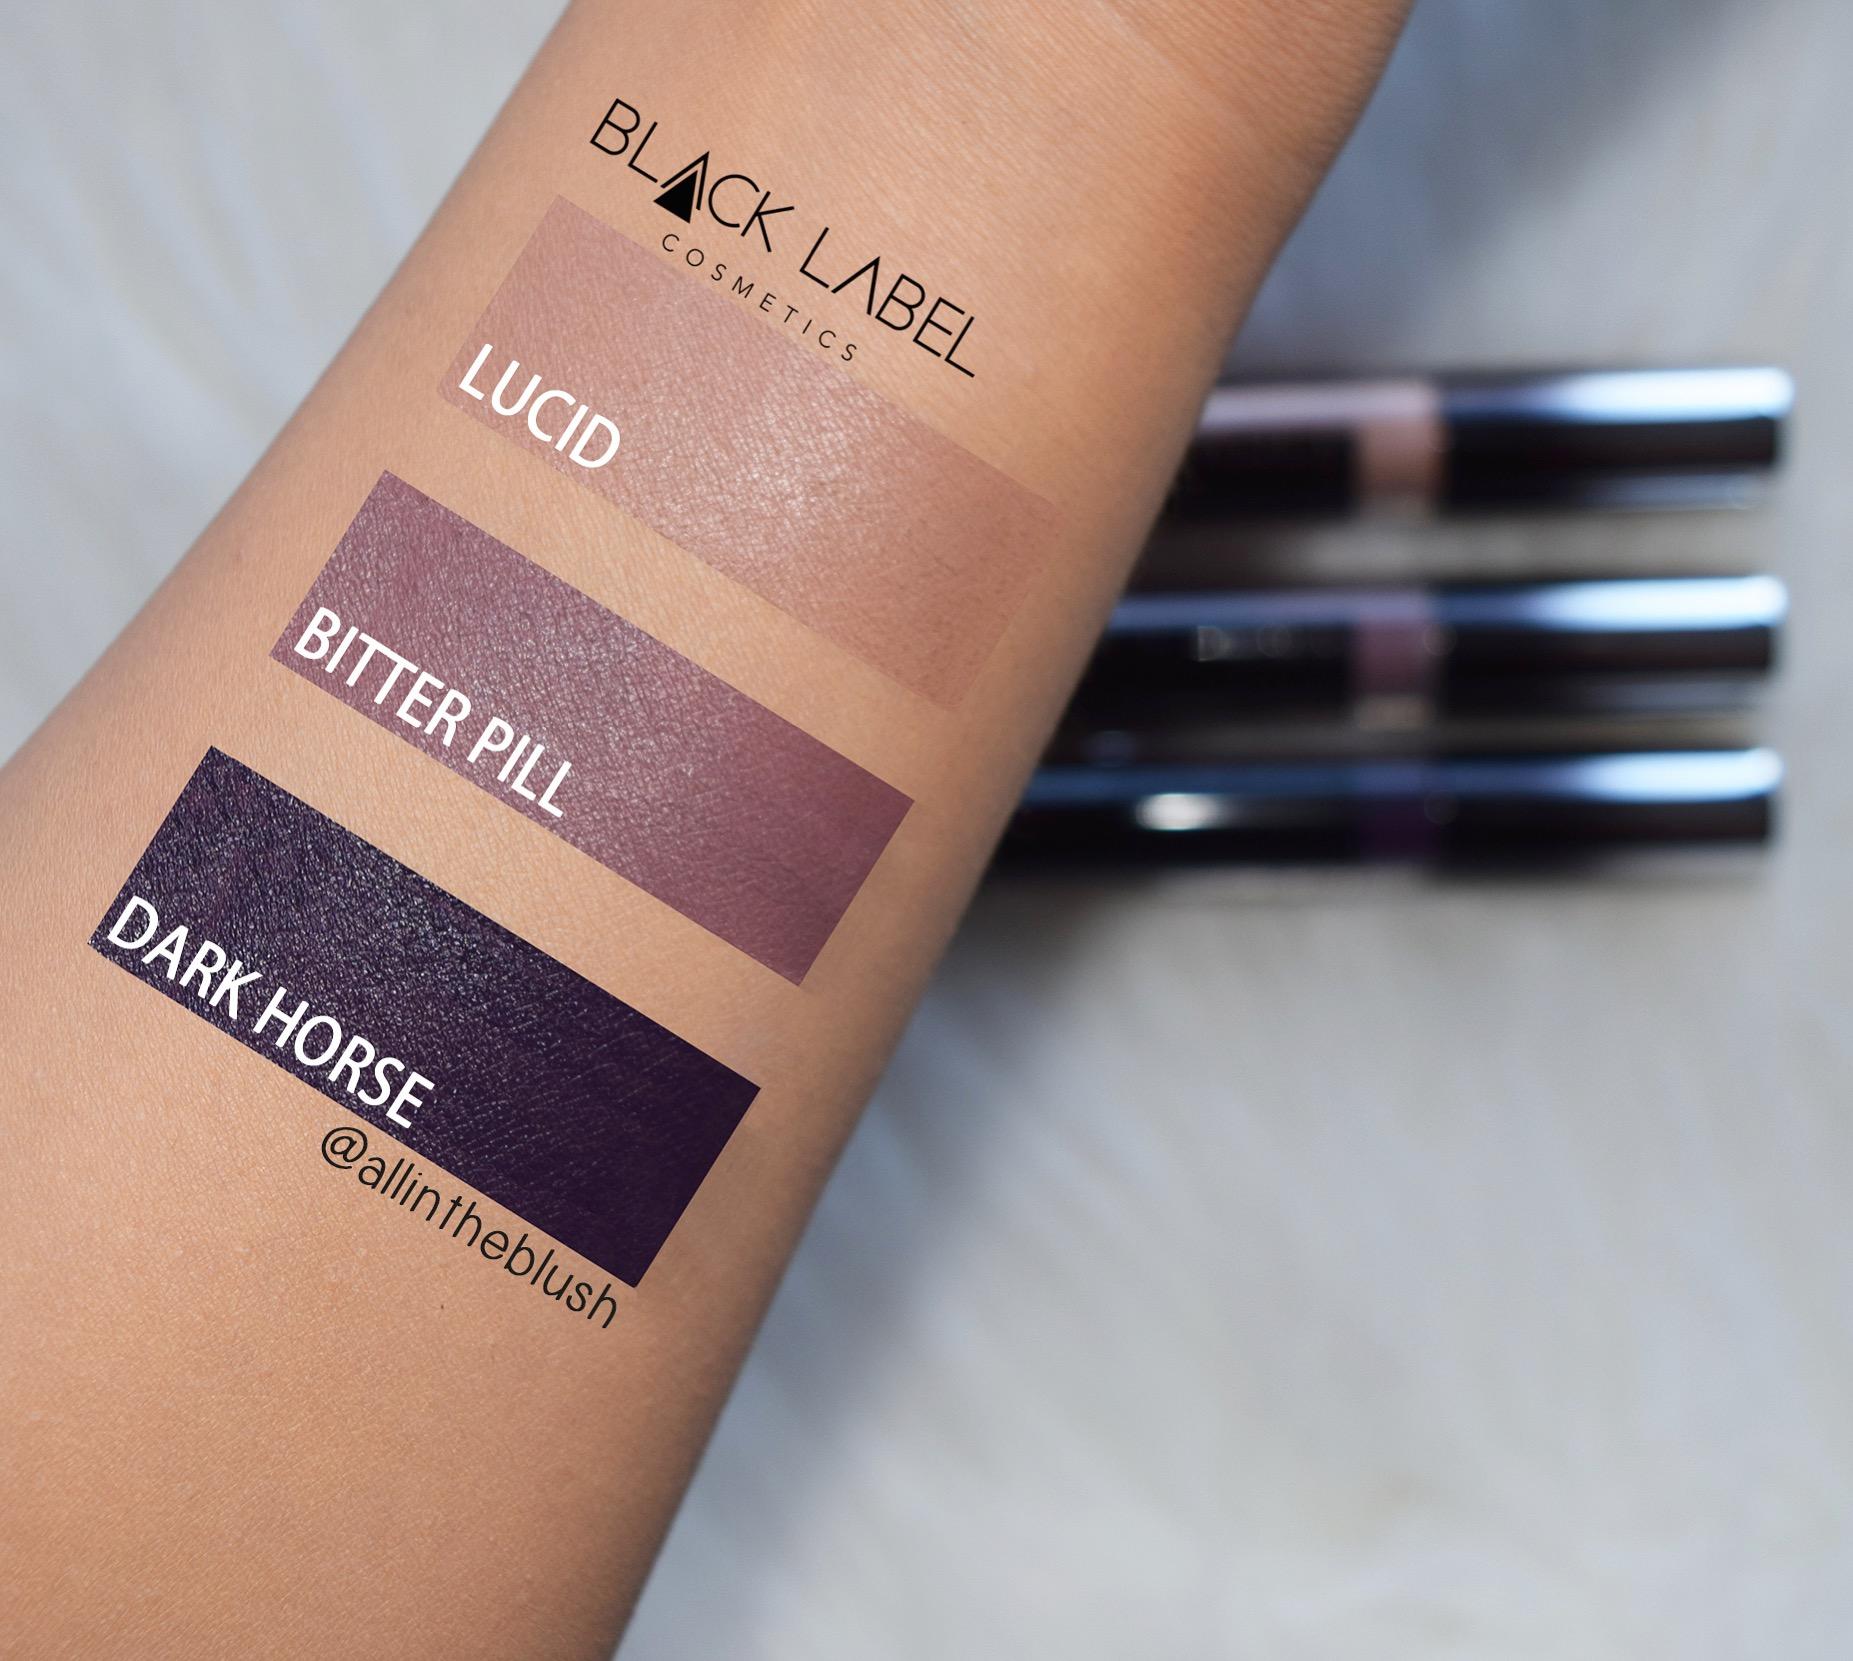 Black Label Lipstick Swatches